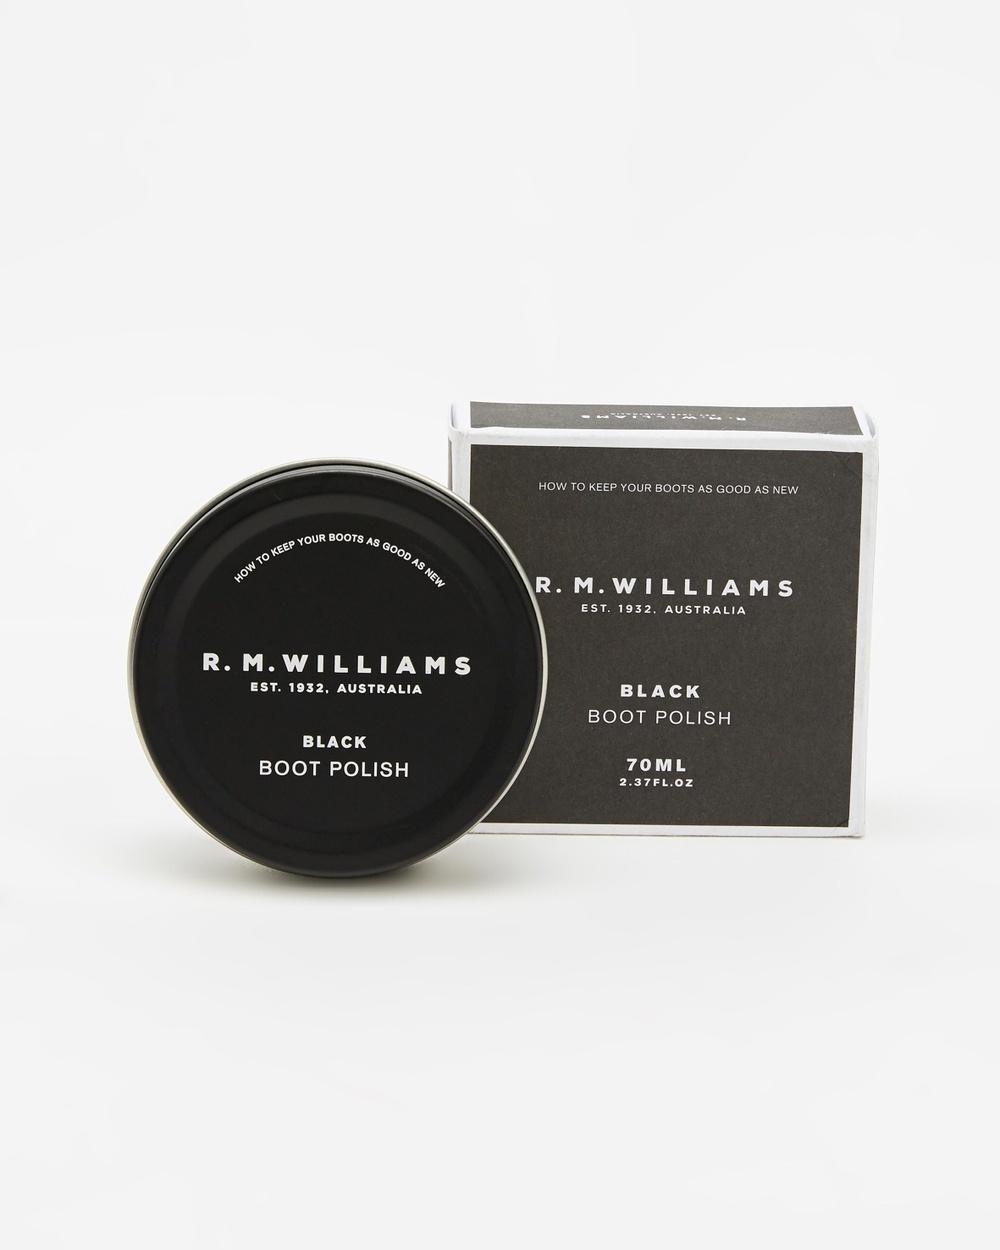 R.M.Williams Stockman's Boot Polish Accessories Black